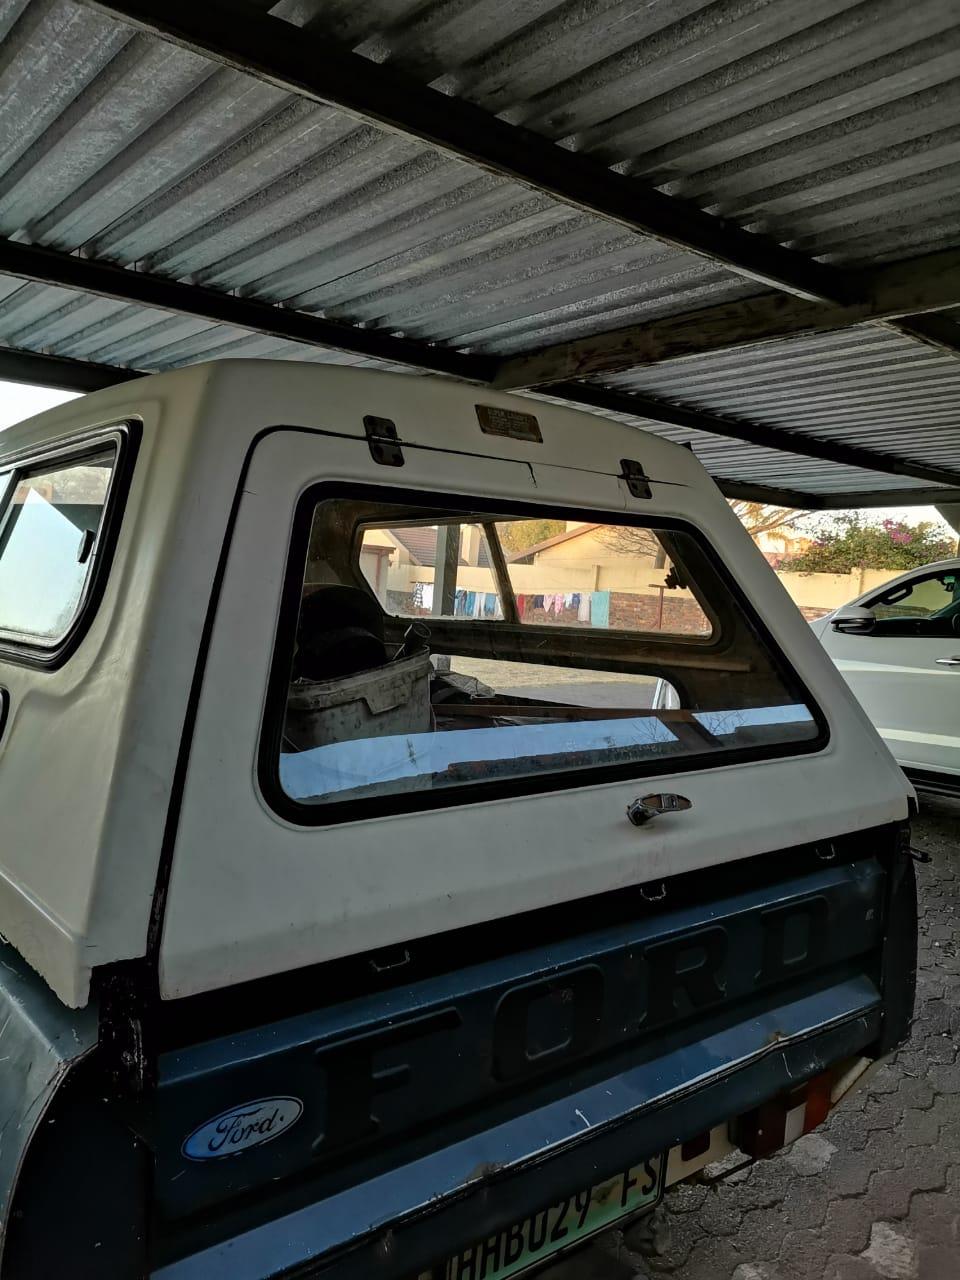 Ford Cortina 1984 3l canopy